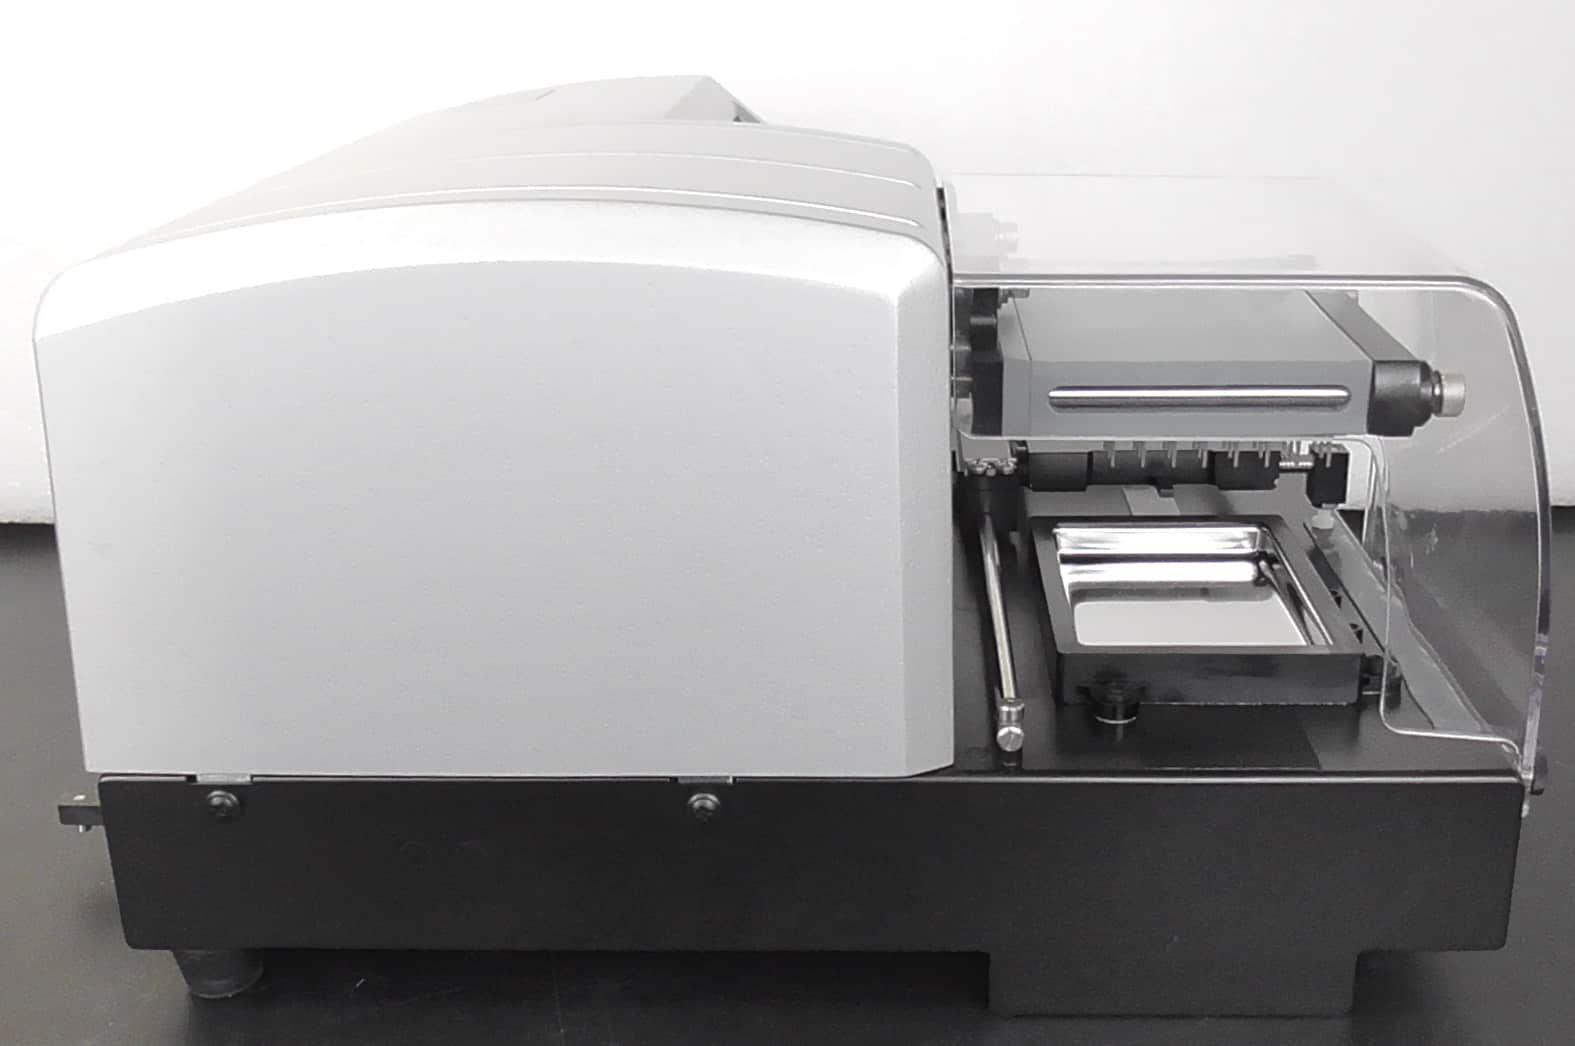 Biotek 405 TSRSMML Microplate Washer with Optional Accessories